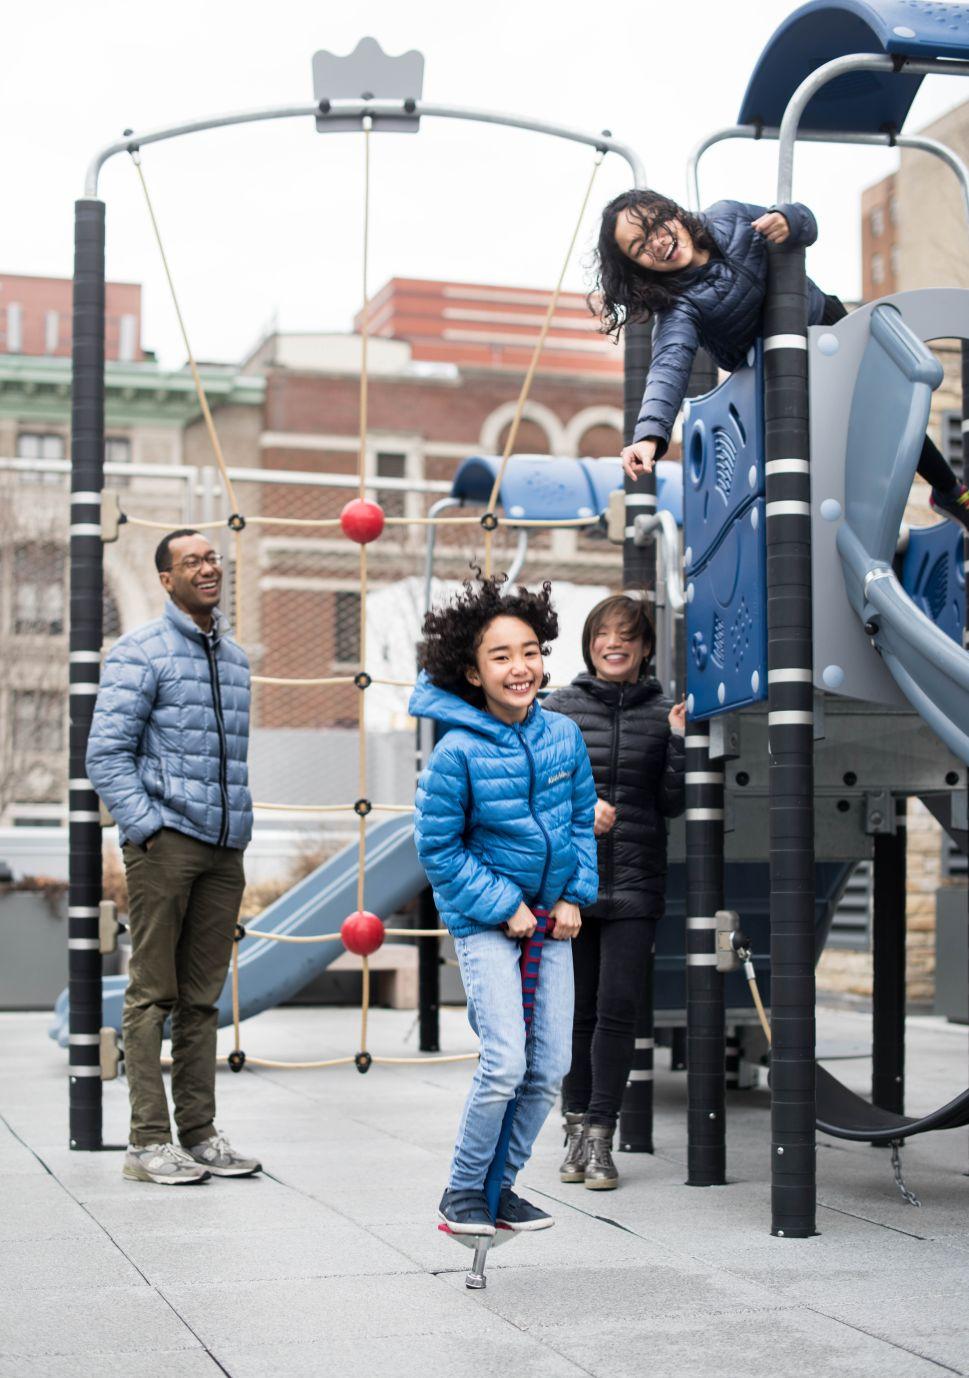 Karaoke Rooms and Climbing Walls: Kids' Amenities Go Over the Top